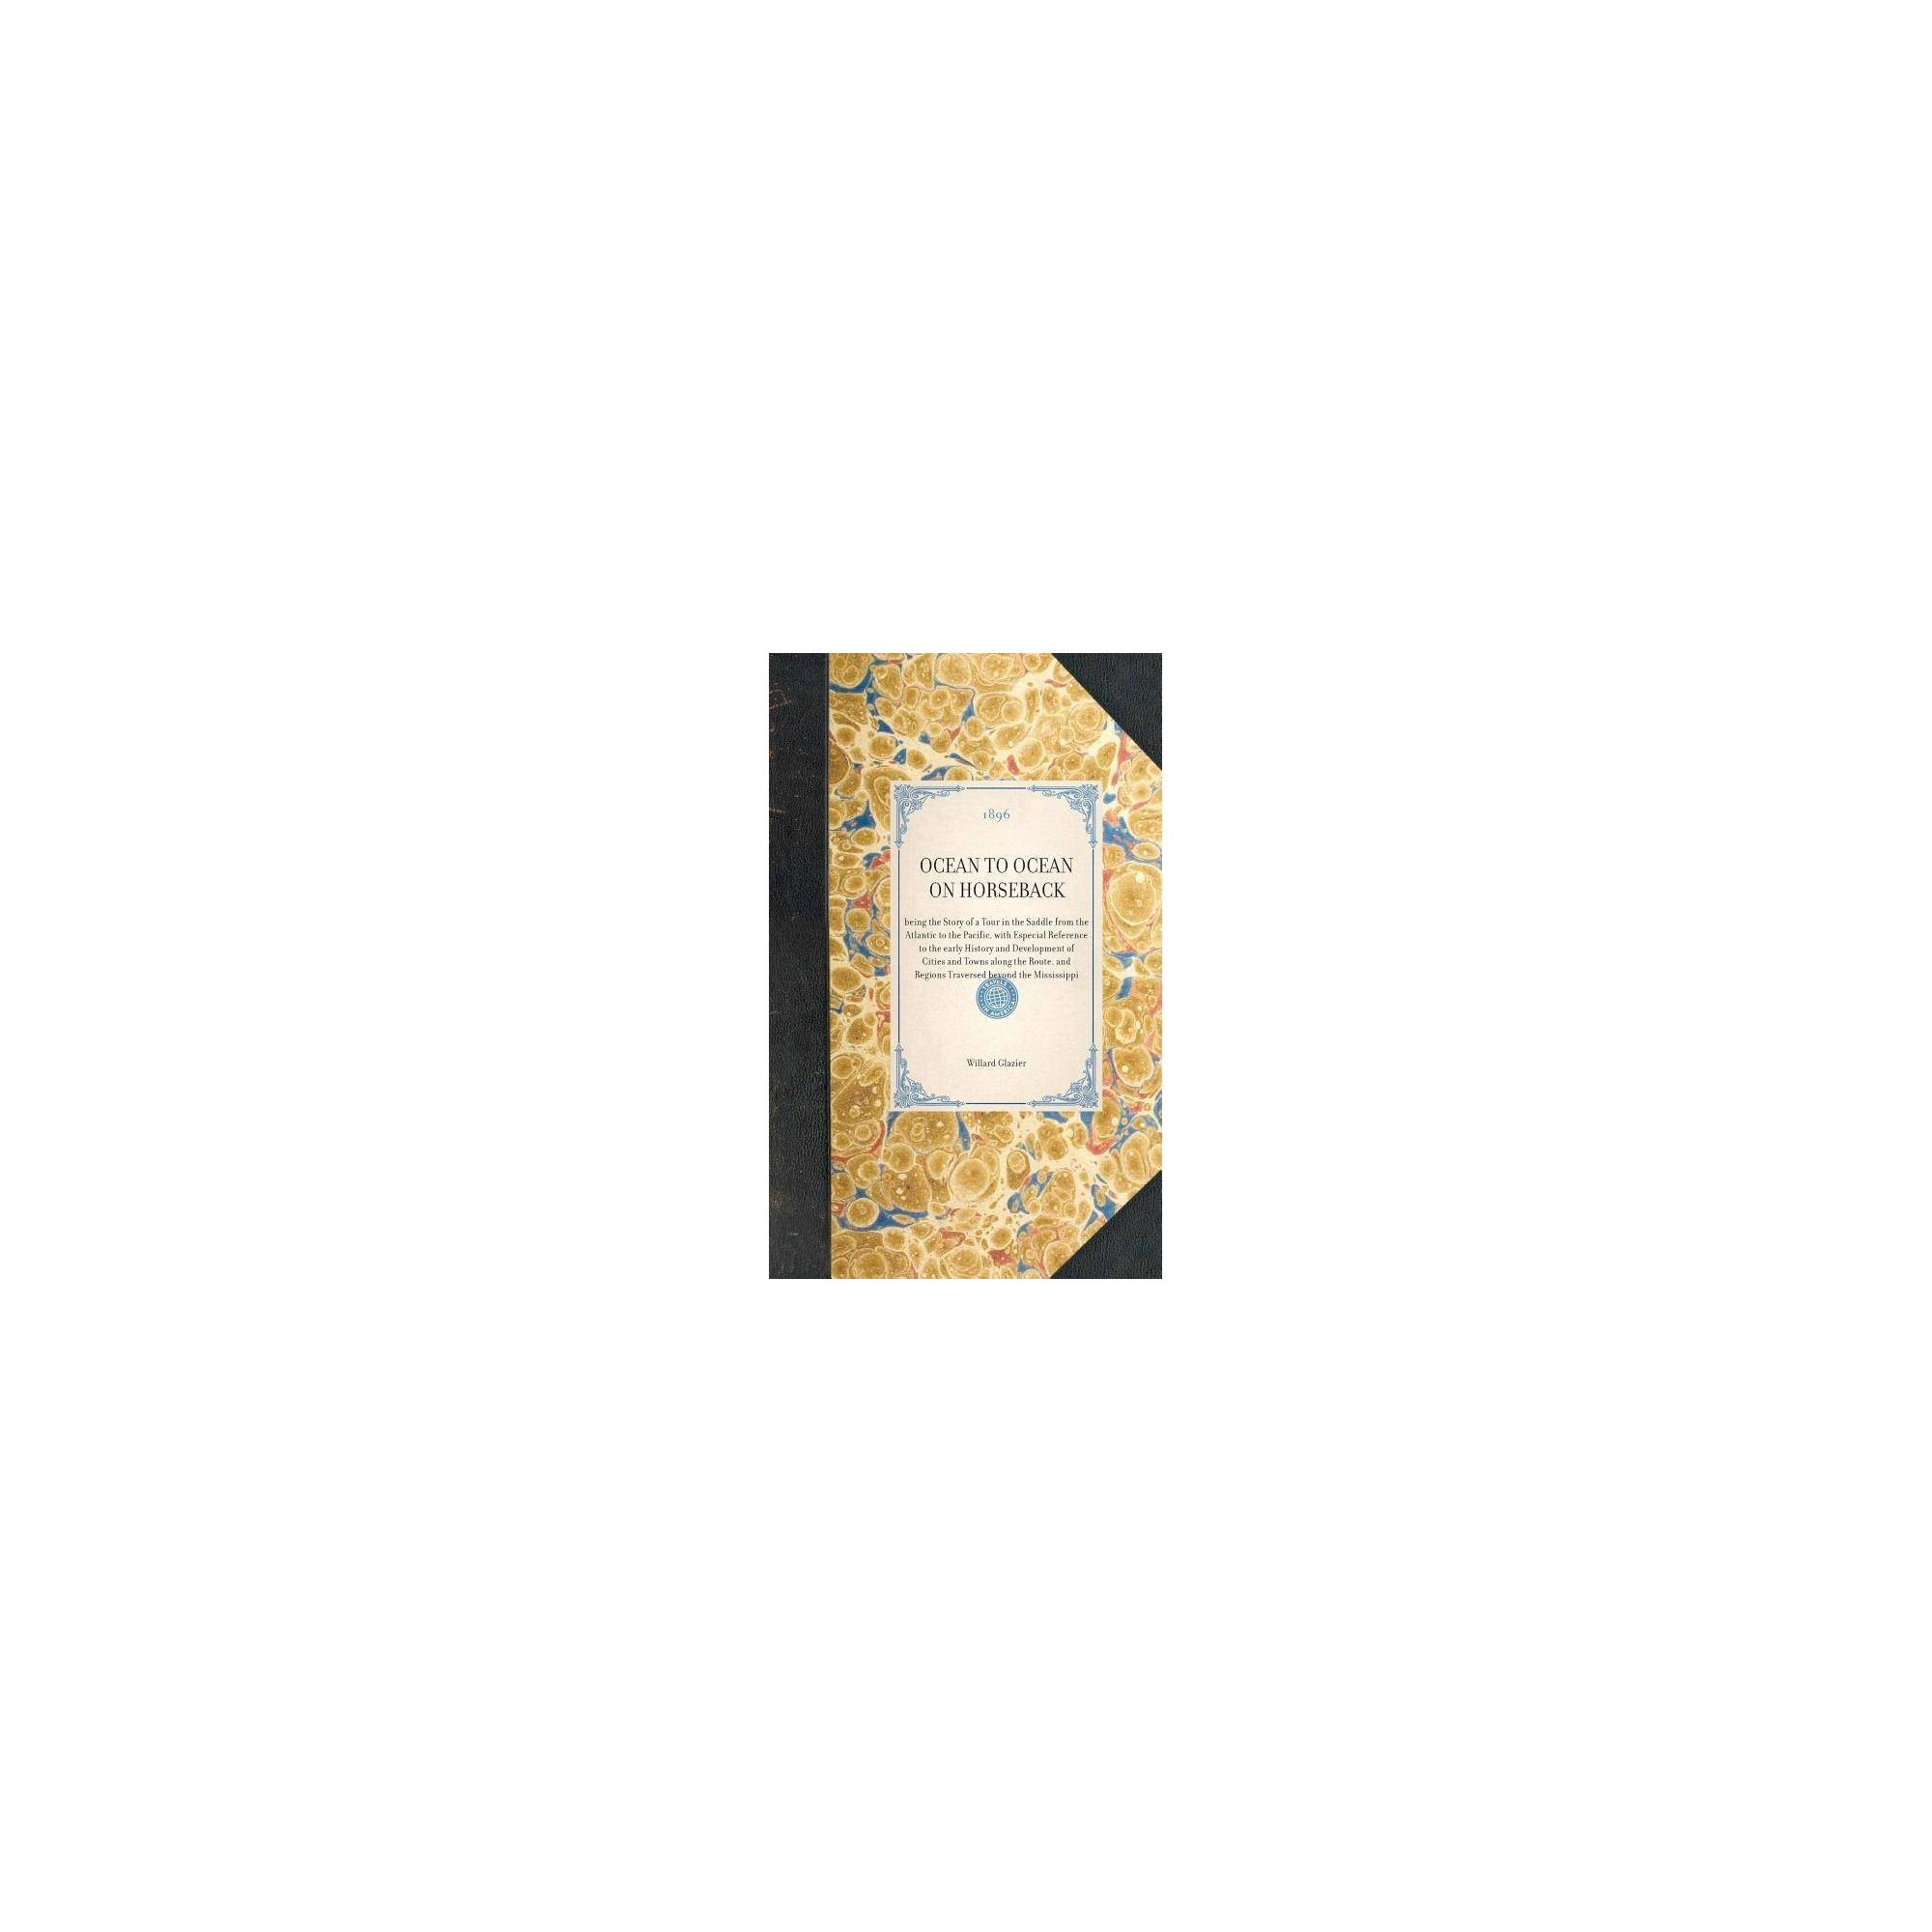 Ocean to Ocean on Horseback - (Travel in America) by Willard Glazier (Hardcover)